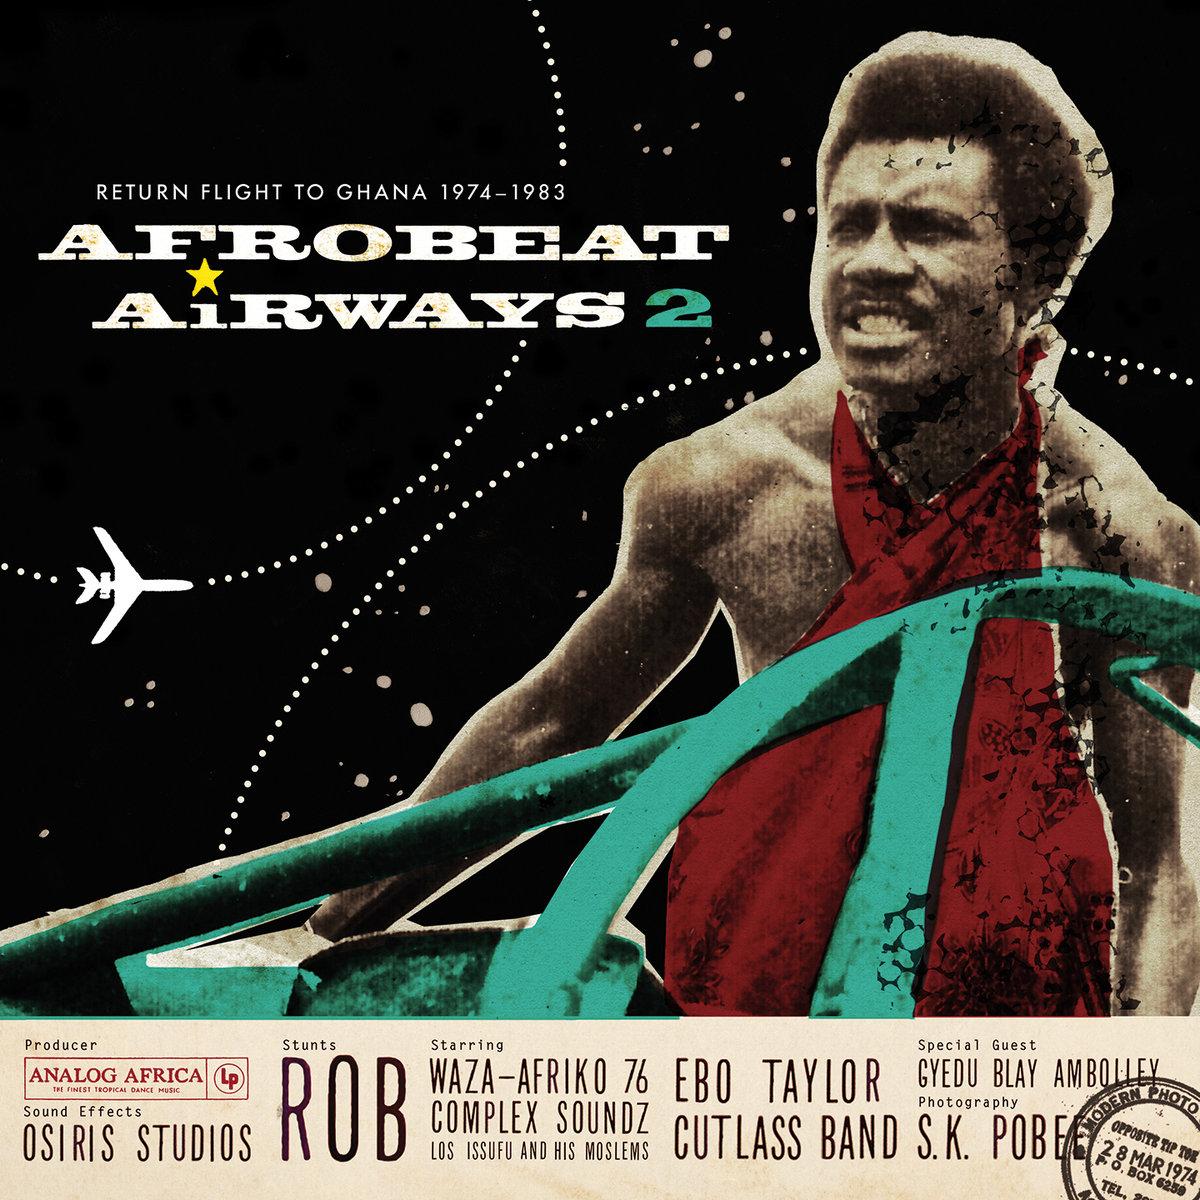 Afrobeat Airways 2: Return Flight to Ghana 1974-1983  Release Date: September 17, 2013 Label: Analog Africa  SERVICE: Restoration, Mastering SOURCE MATERIAL: 45 rpm records NUMBER OF DISCS: 1 GENRE: Afrobeat FORMAT: CD and LP